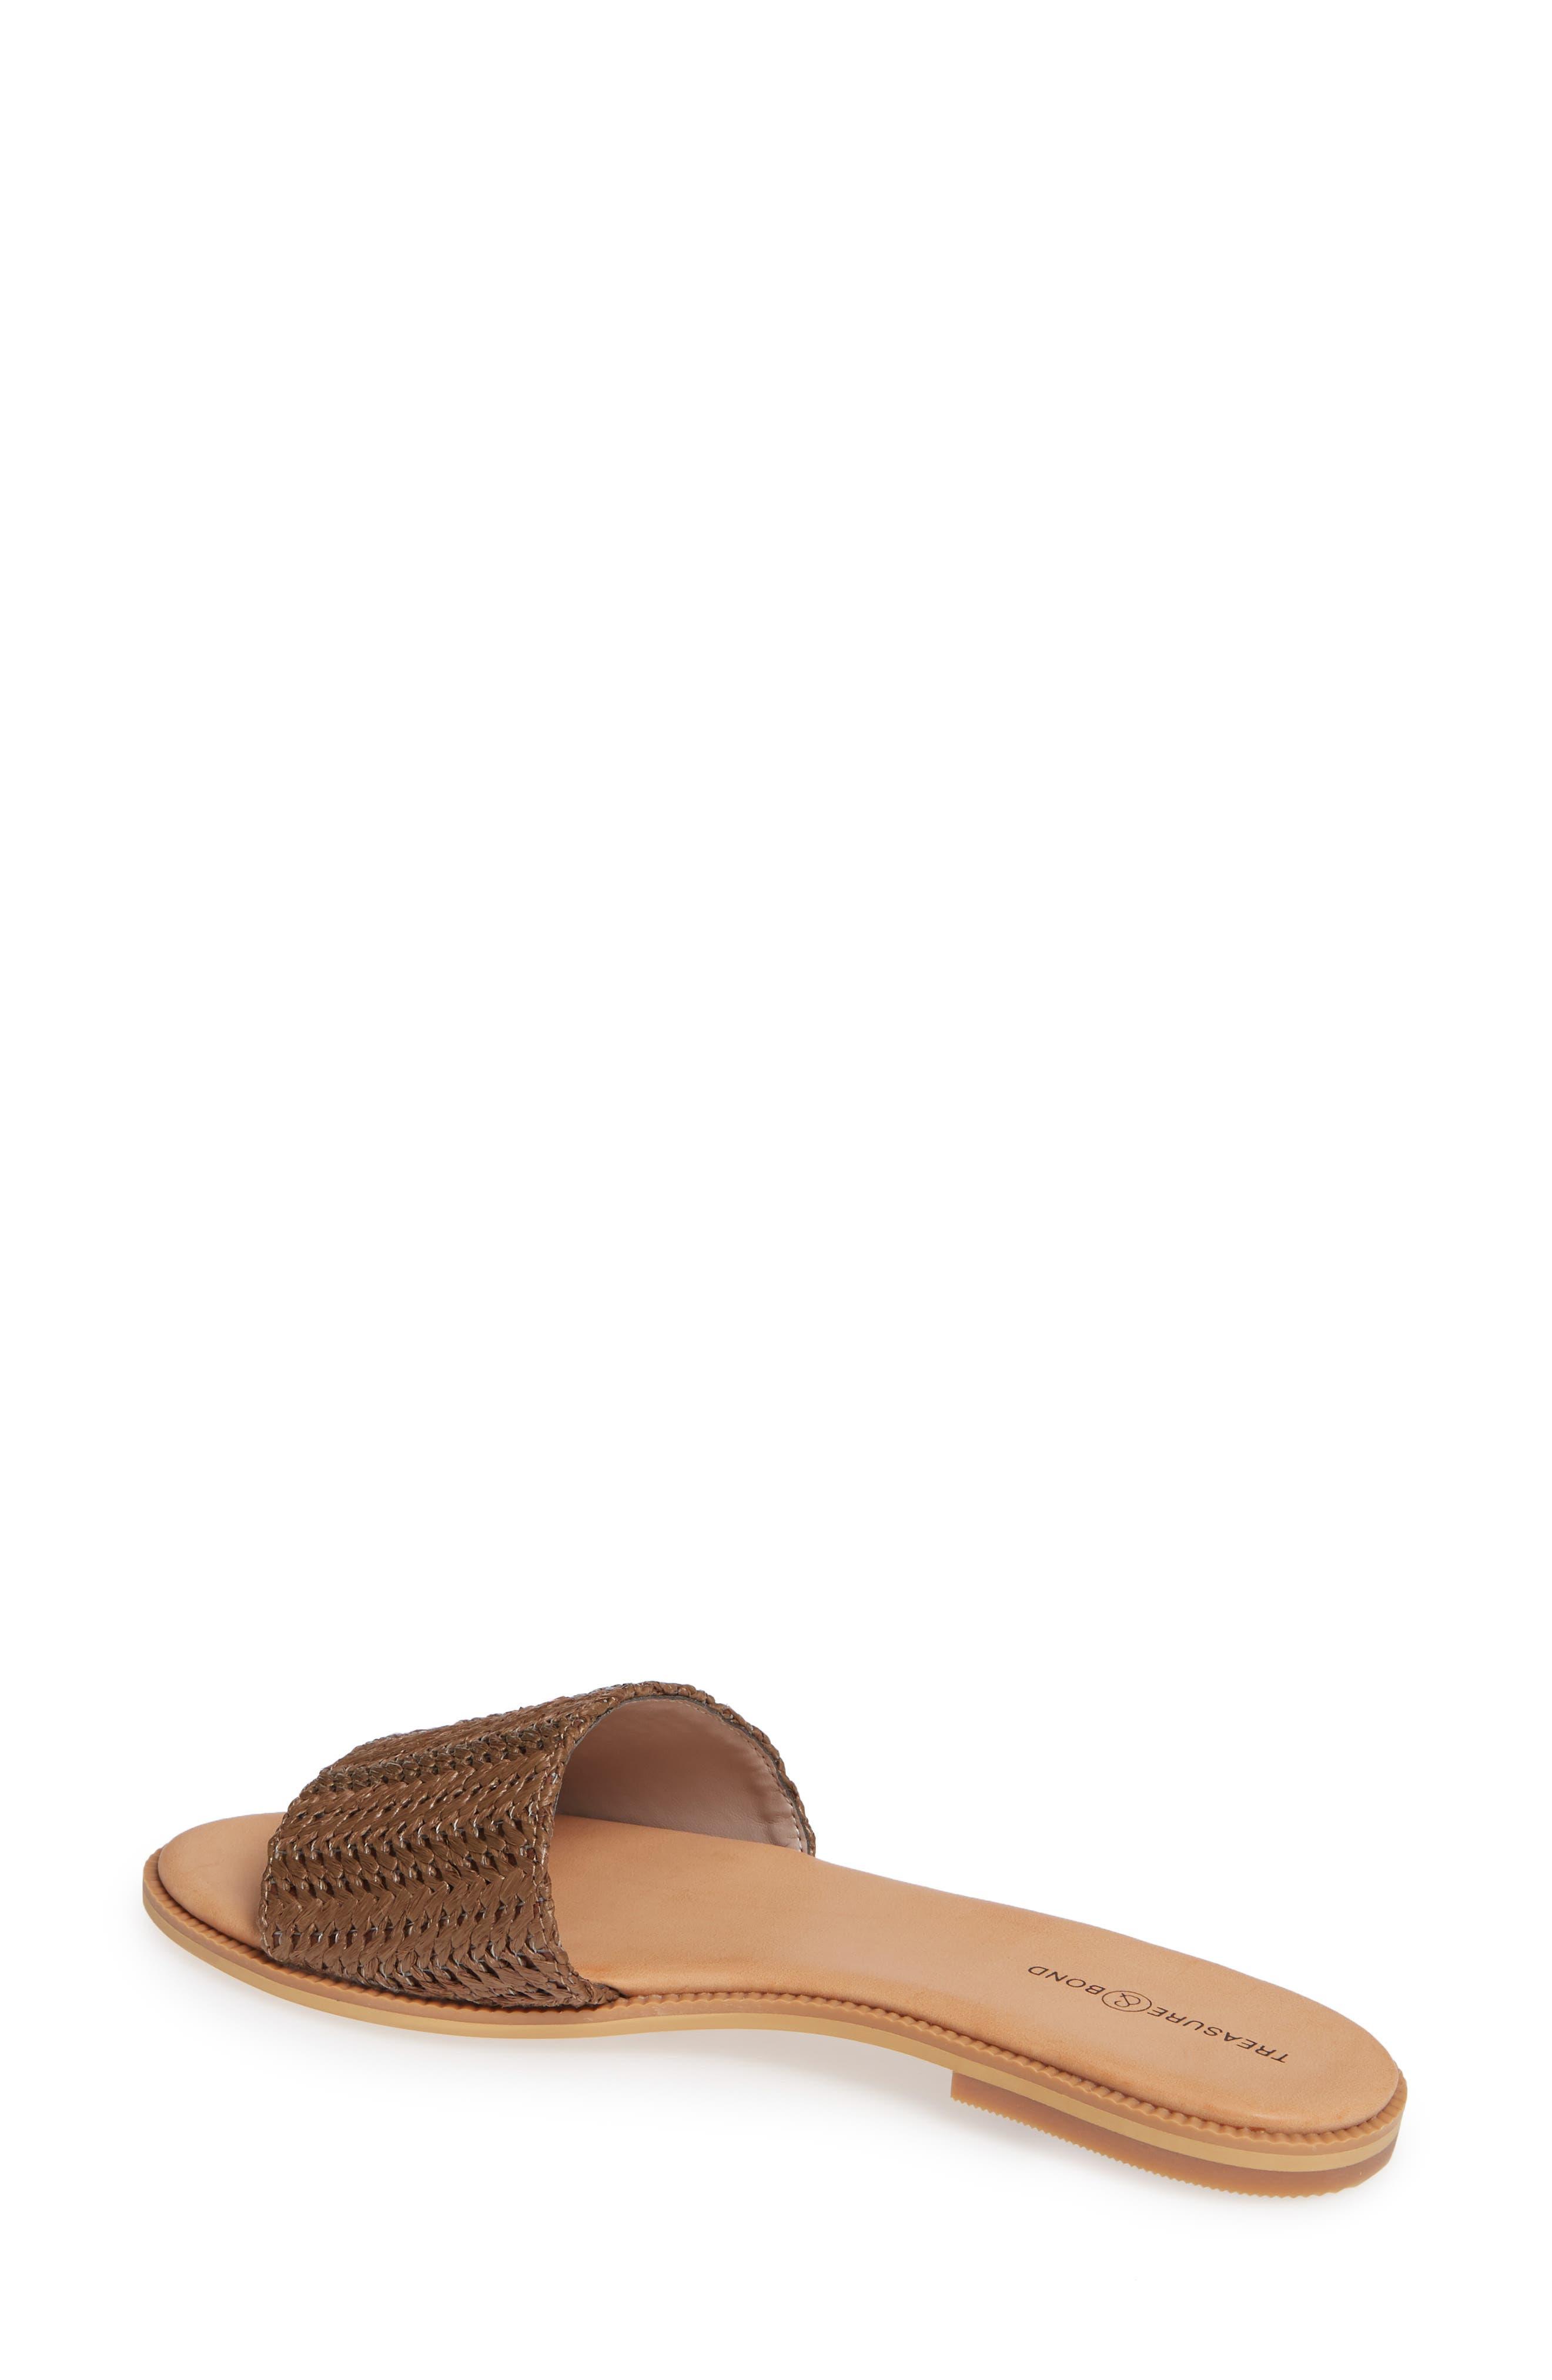 Mere Flat Slide Sandal,                             Alternate thumbnail 2, color,                             BROWN FAUX RAFFIA